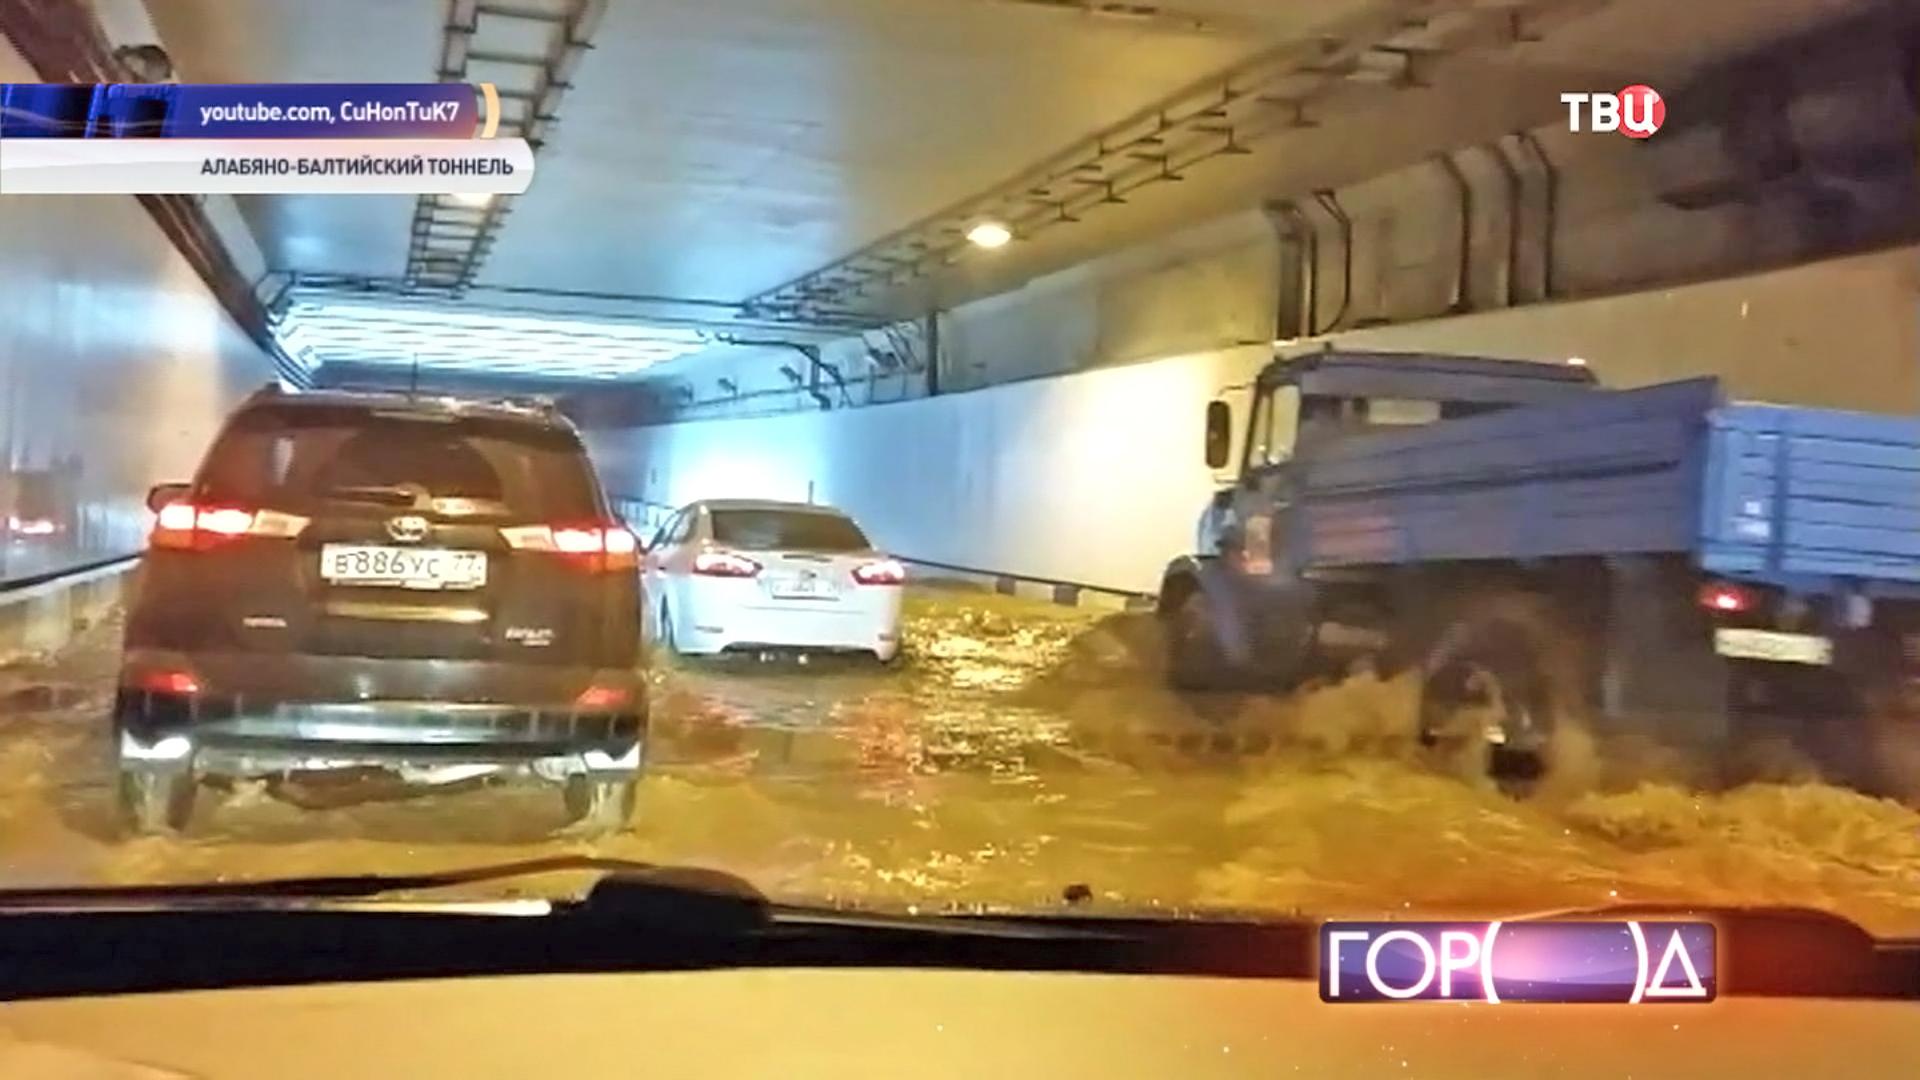 Потоп в Алабяно-Балтийском тоннеле